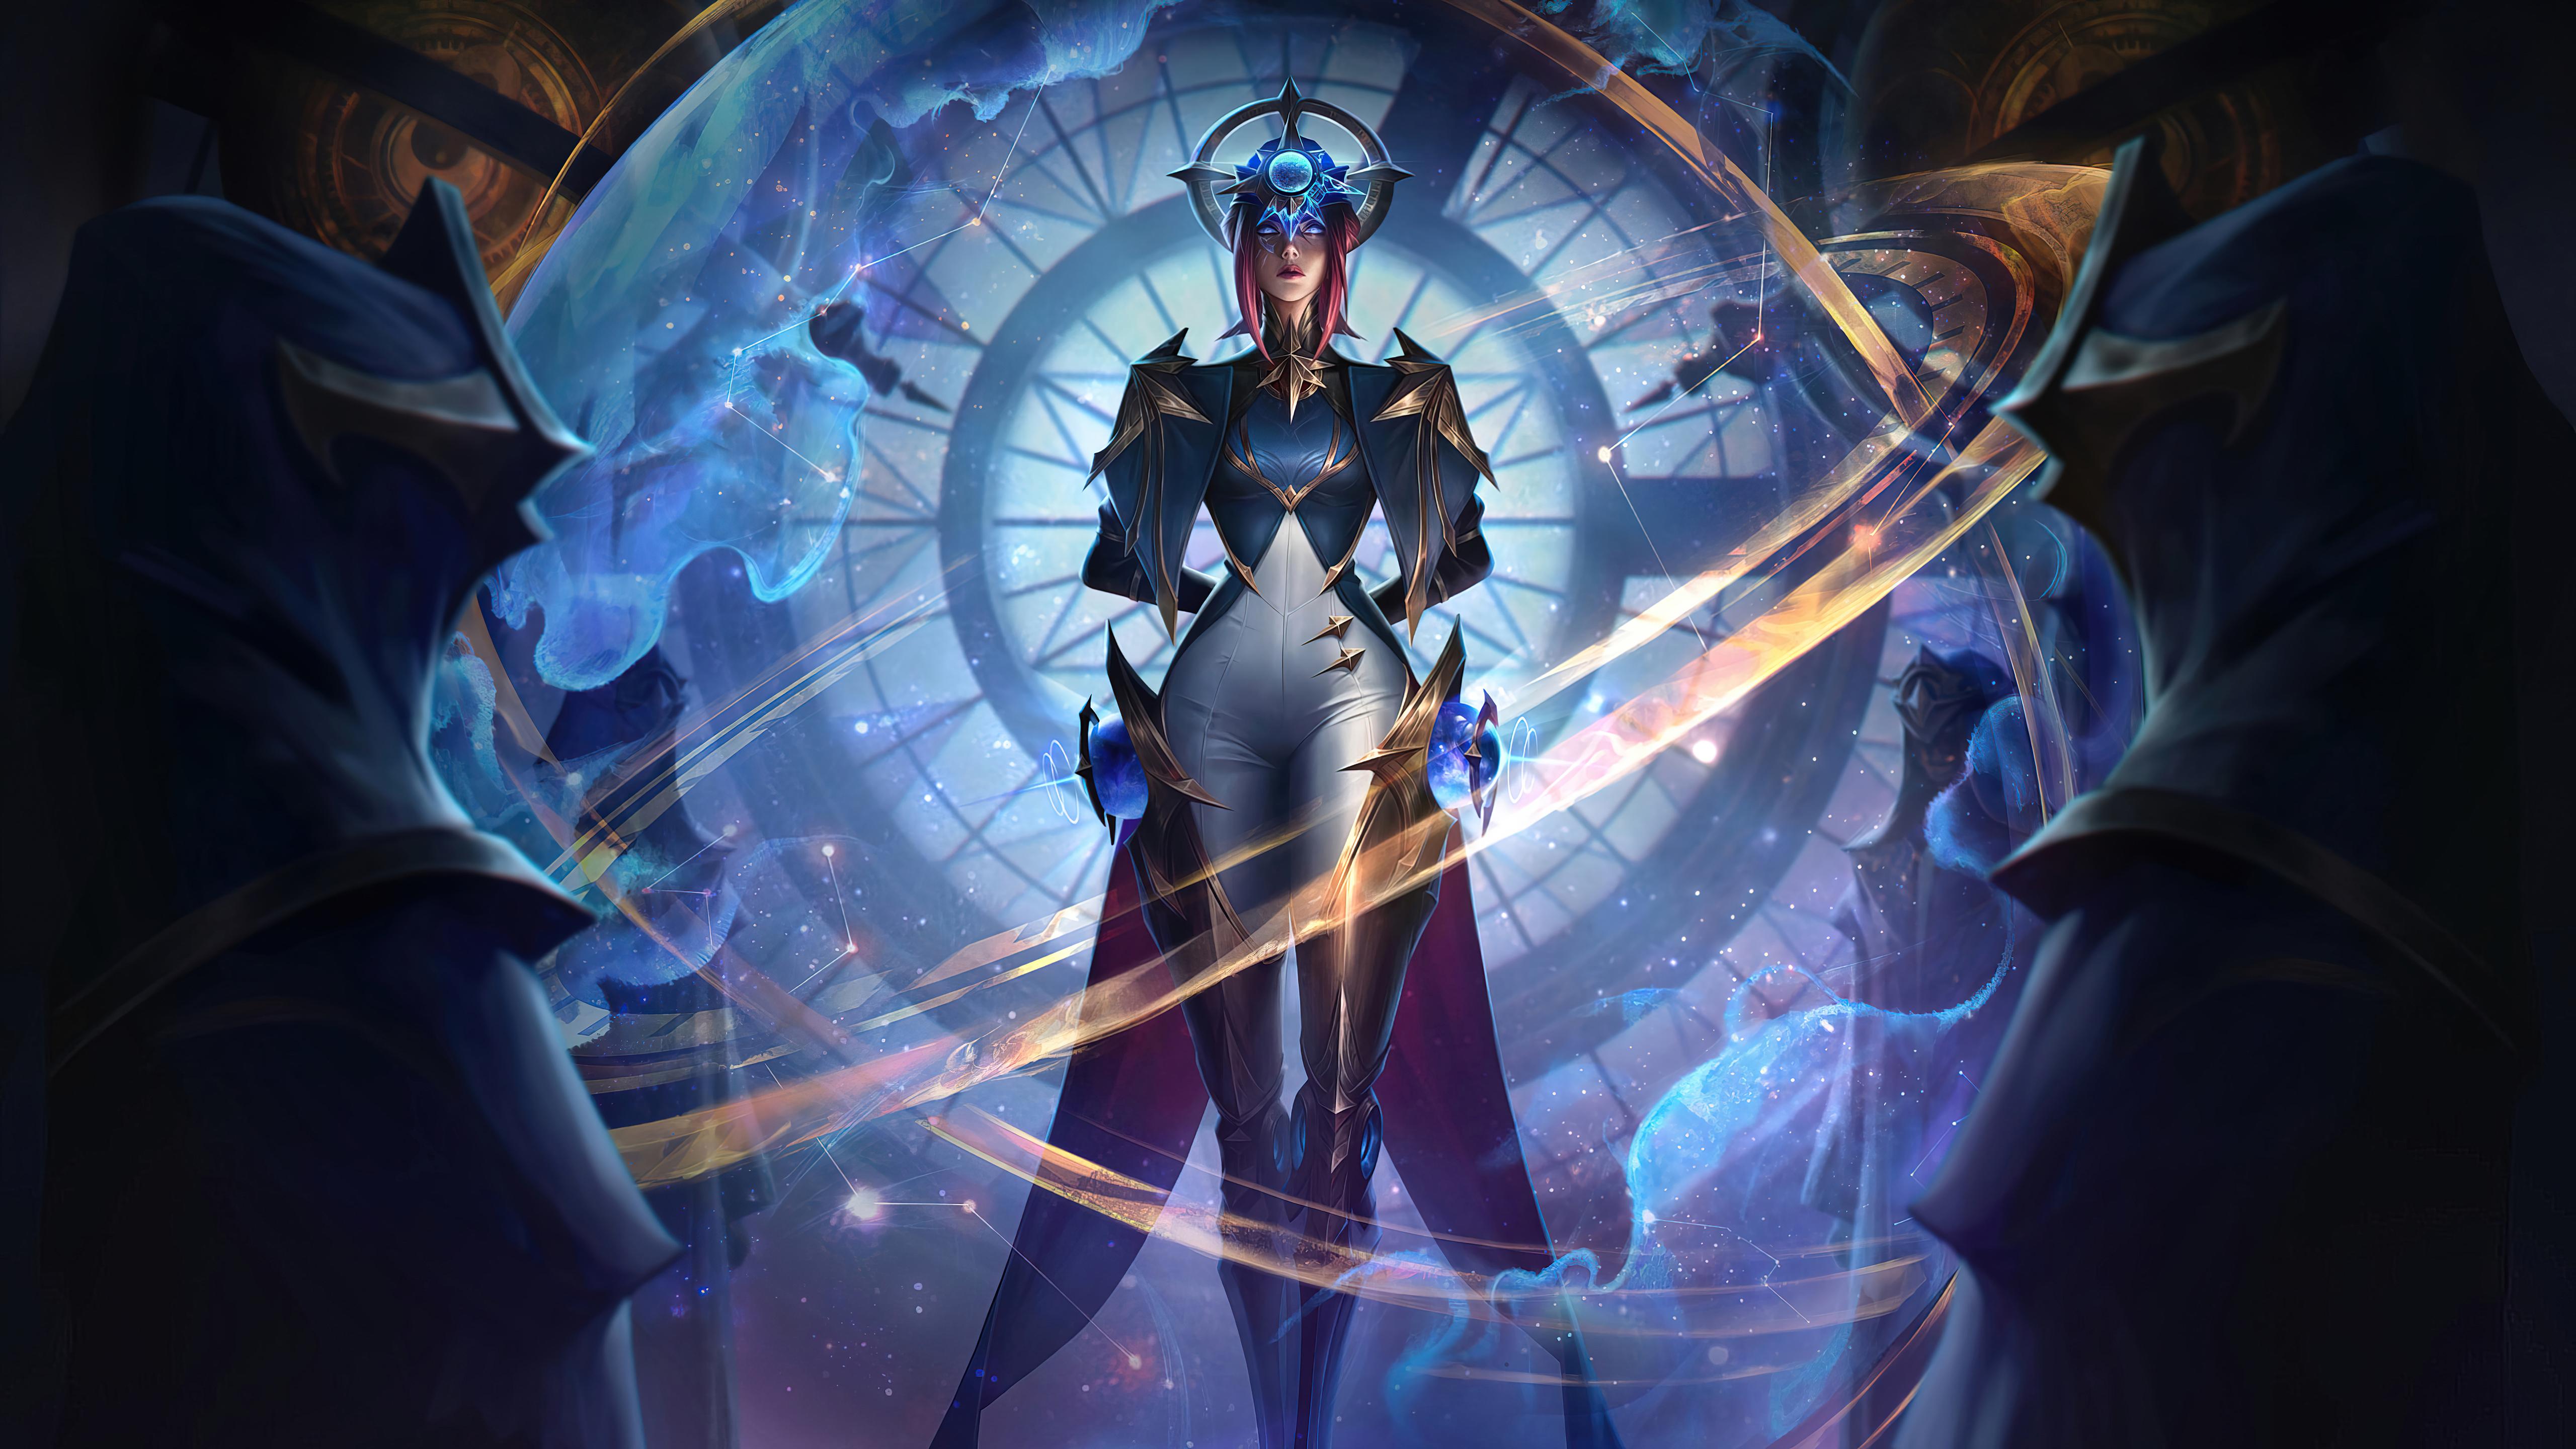 Fondos de pantalla Camille League of Legends